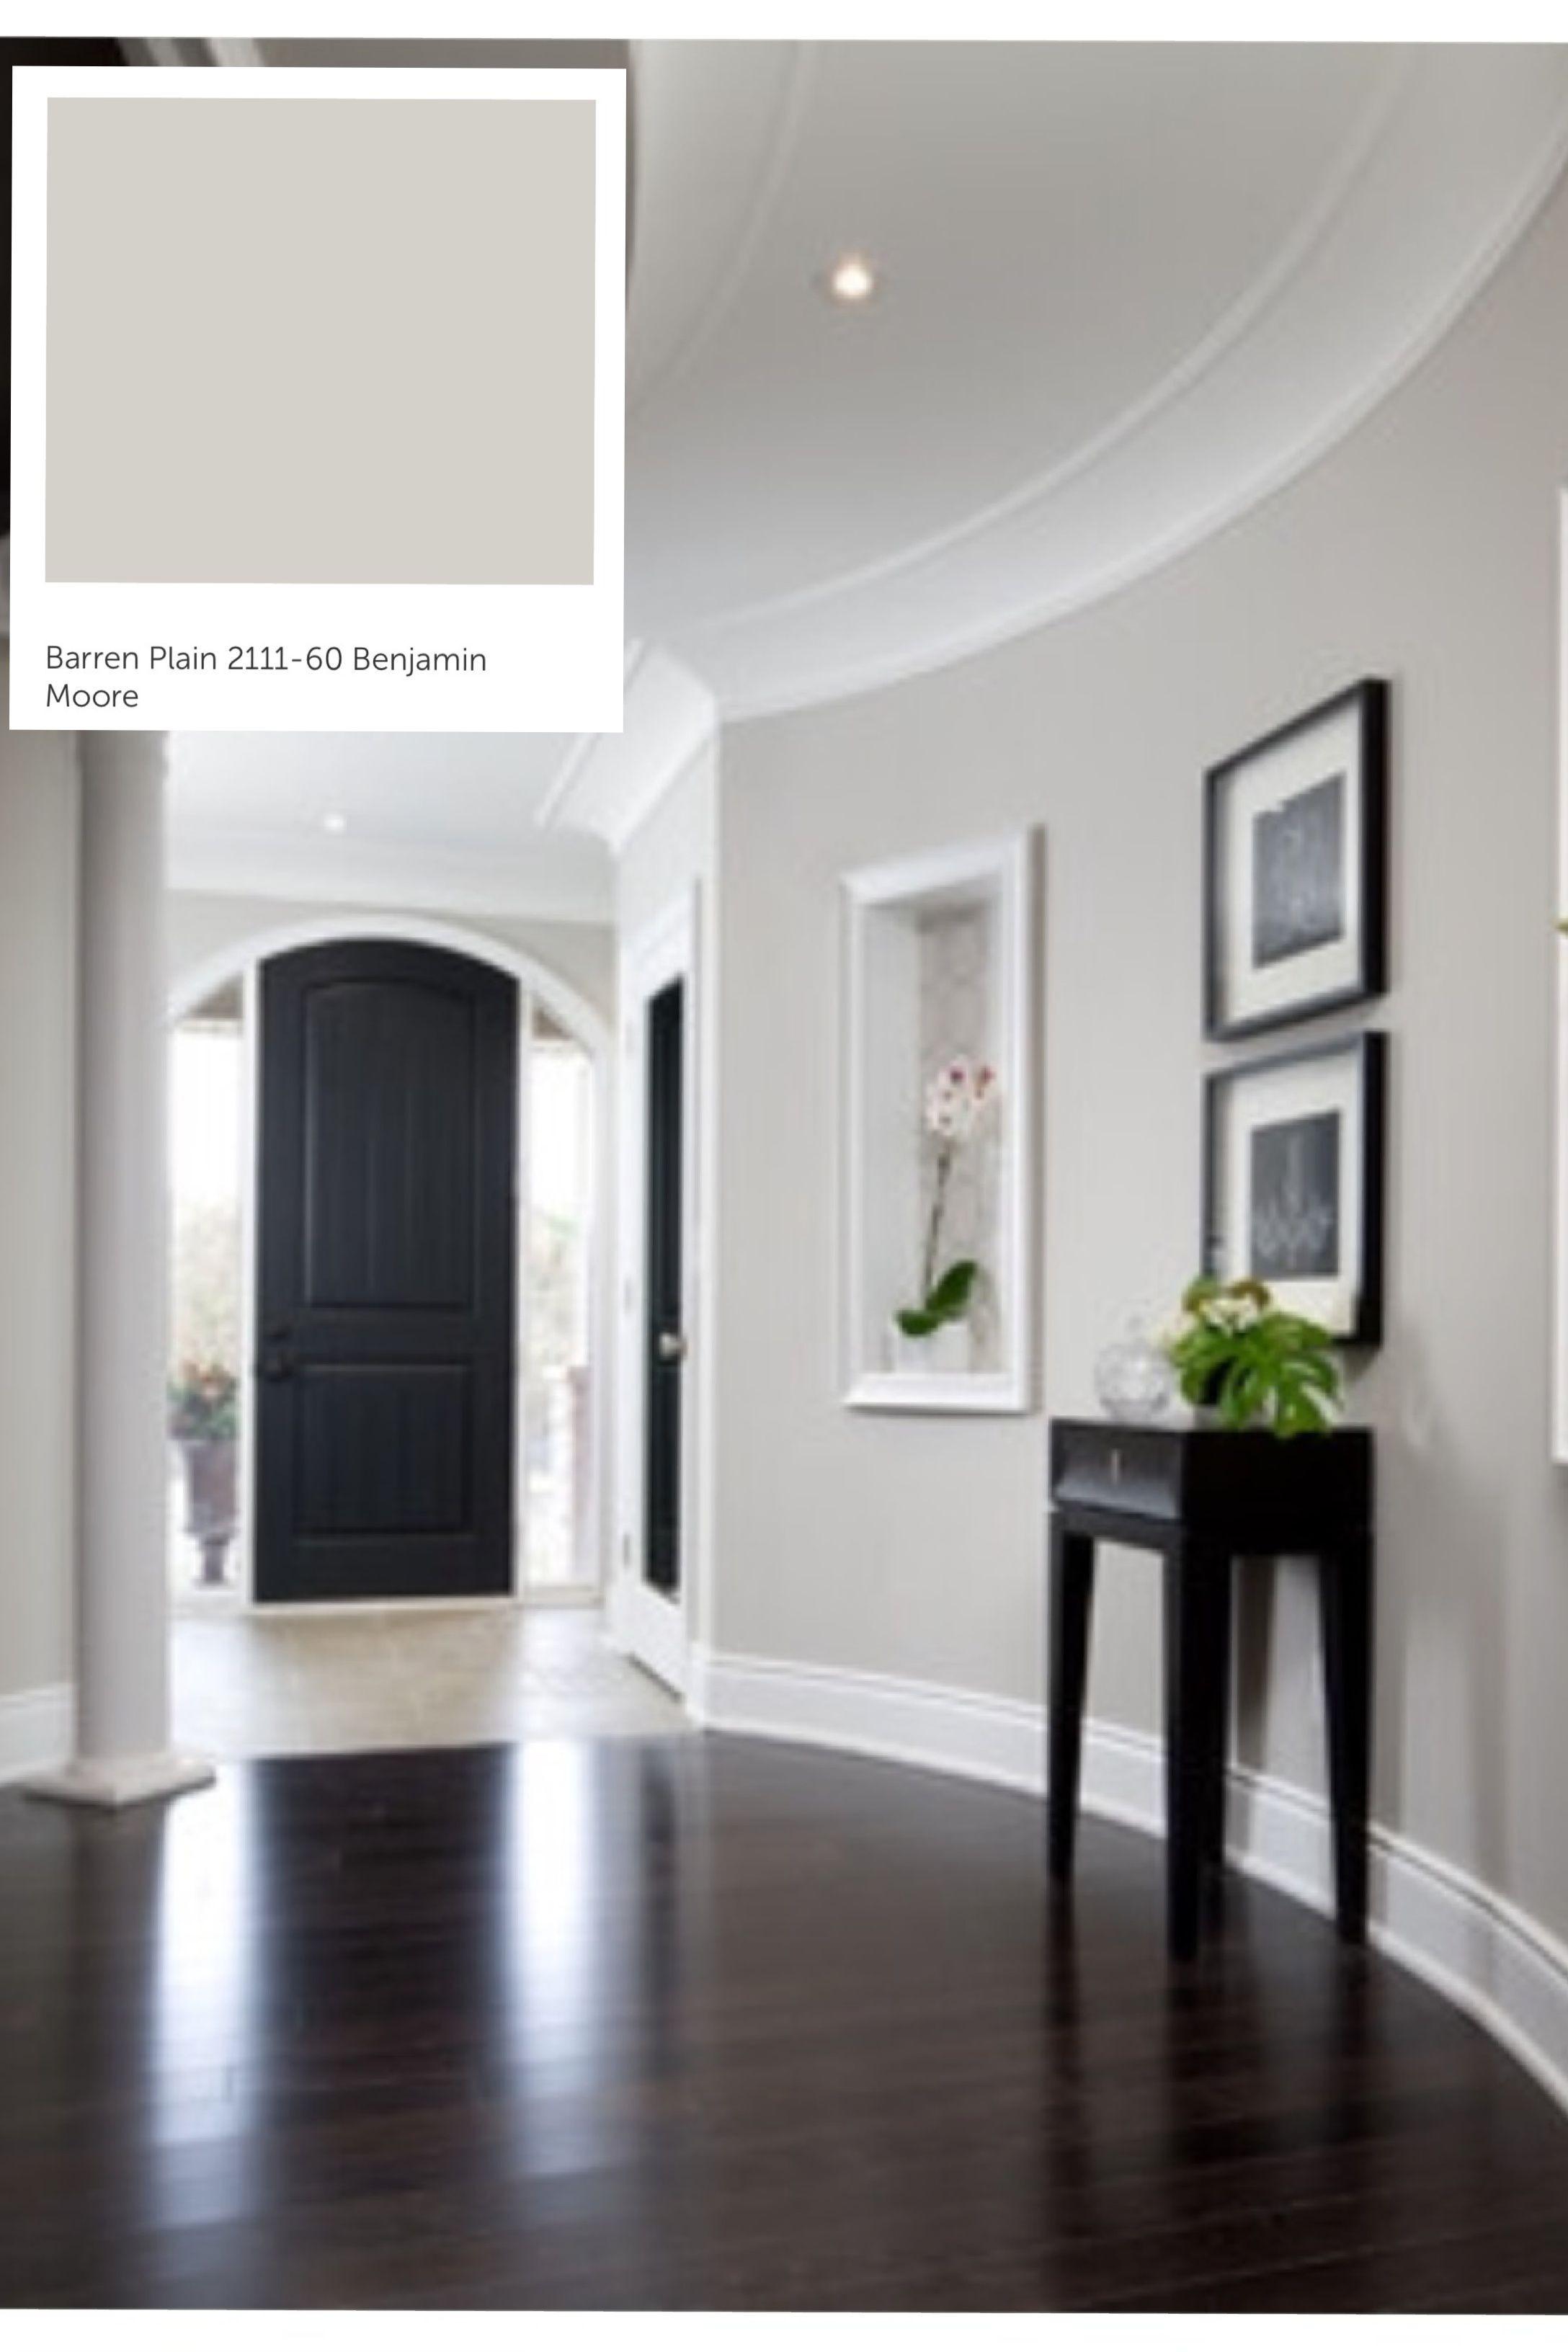 painted hardwood floors pinterest of paint colors that go with grey flooring floor inside paint colors that go with grey flooring pin by vita ziedinya on bedroom pinterest